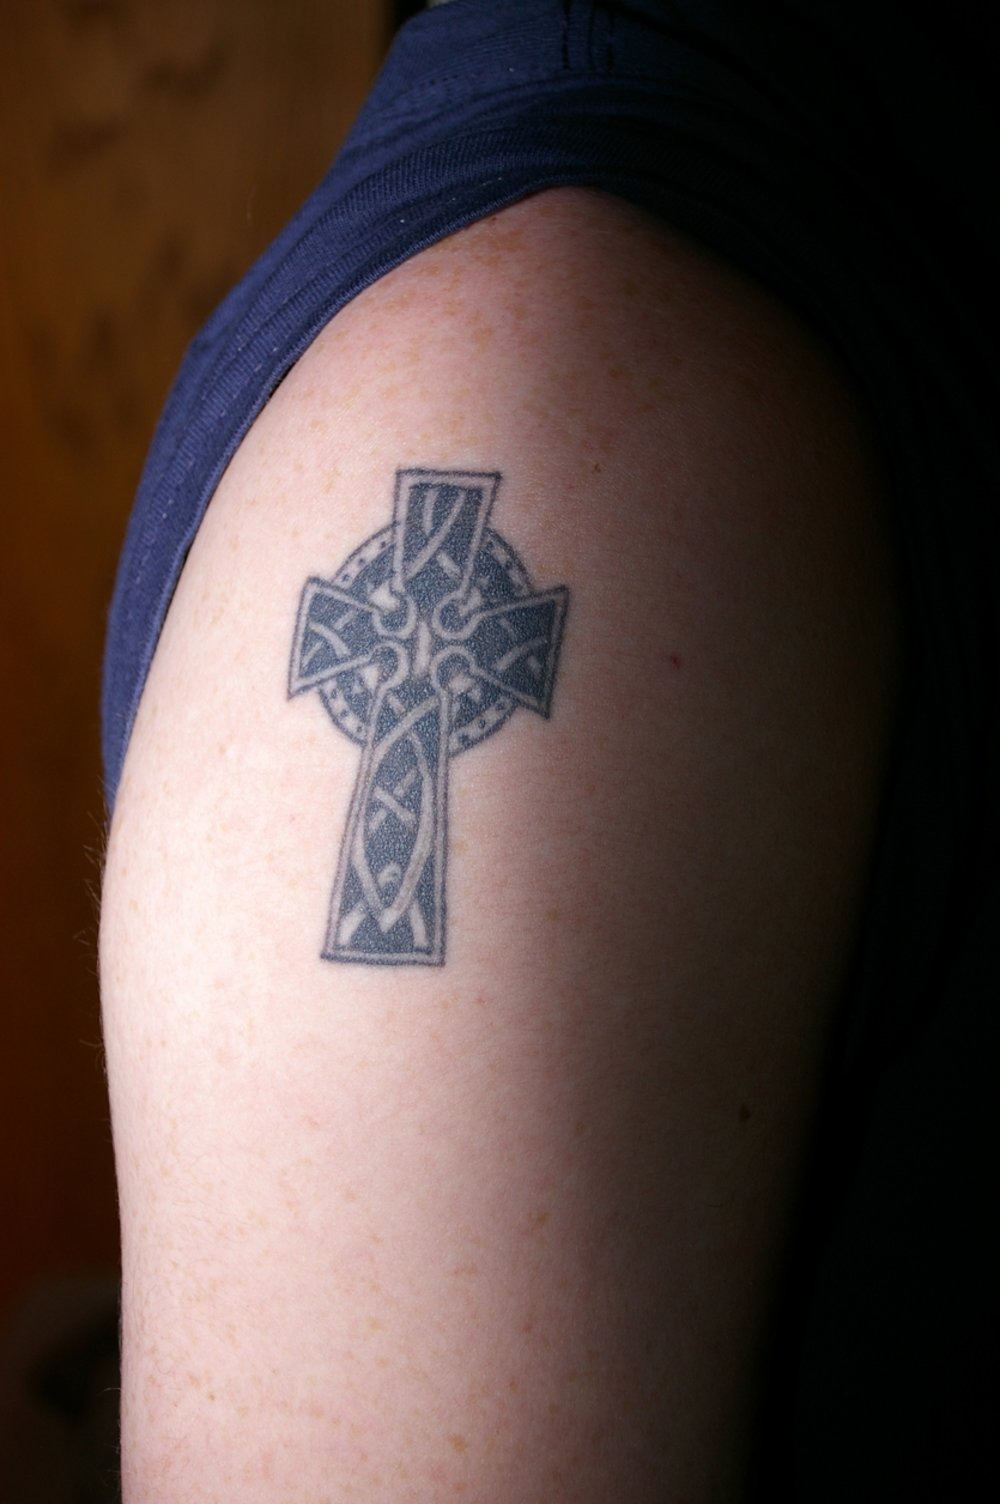 Kreuz Tattoo Bedeutung Schone Vorlagen Desired De